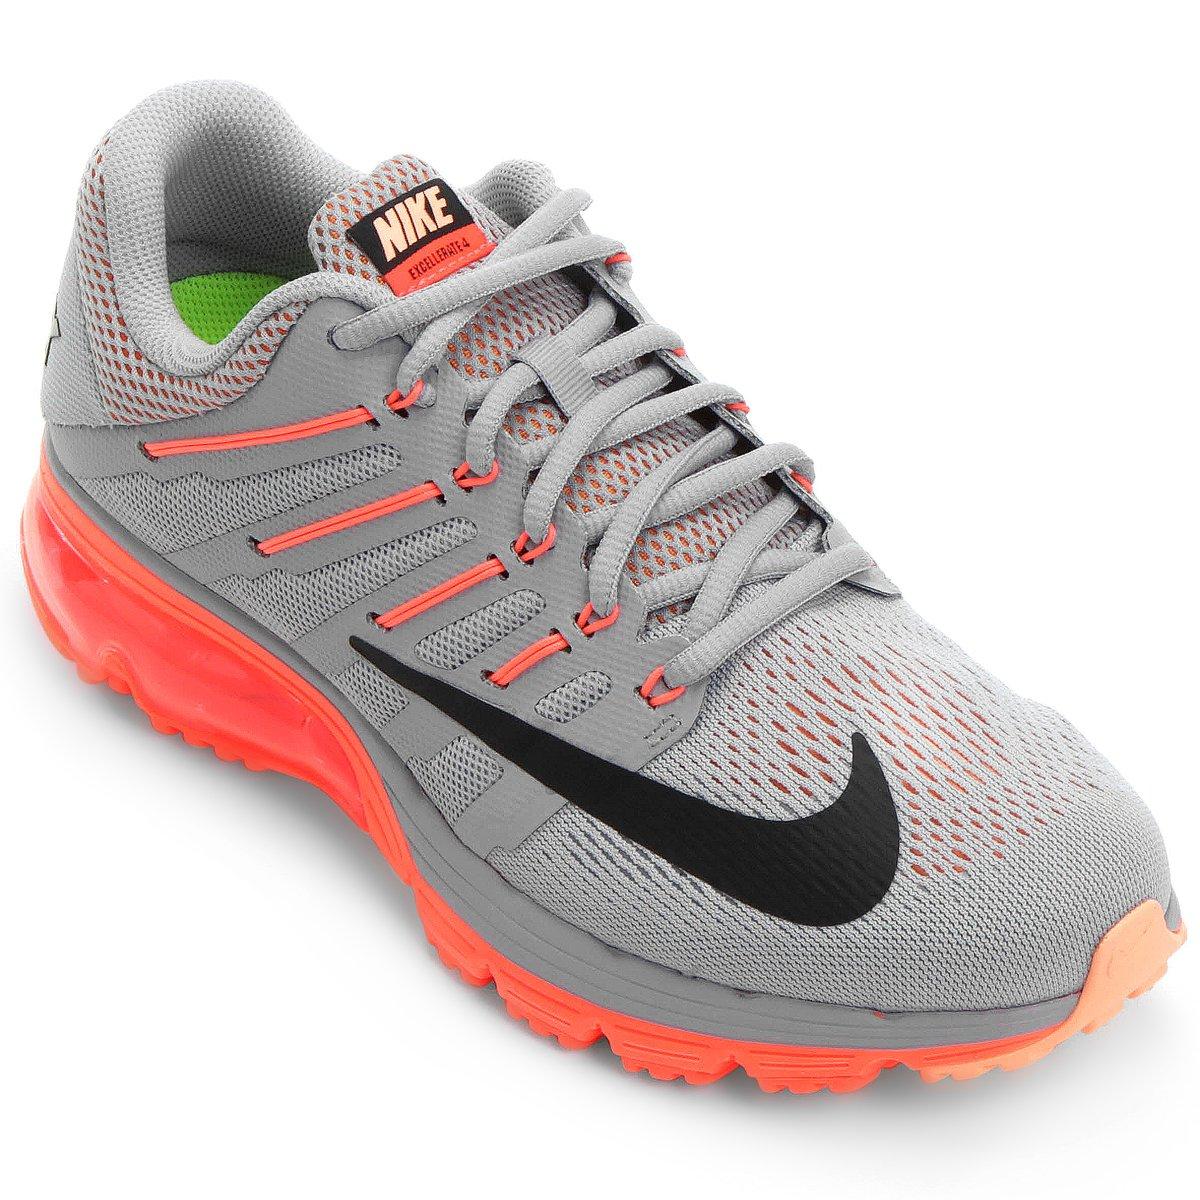 a0e6d22cd Tênis Nike Air Max Excellerate 4 Feminino - Compre Agora